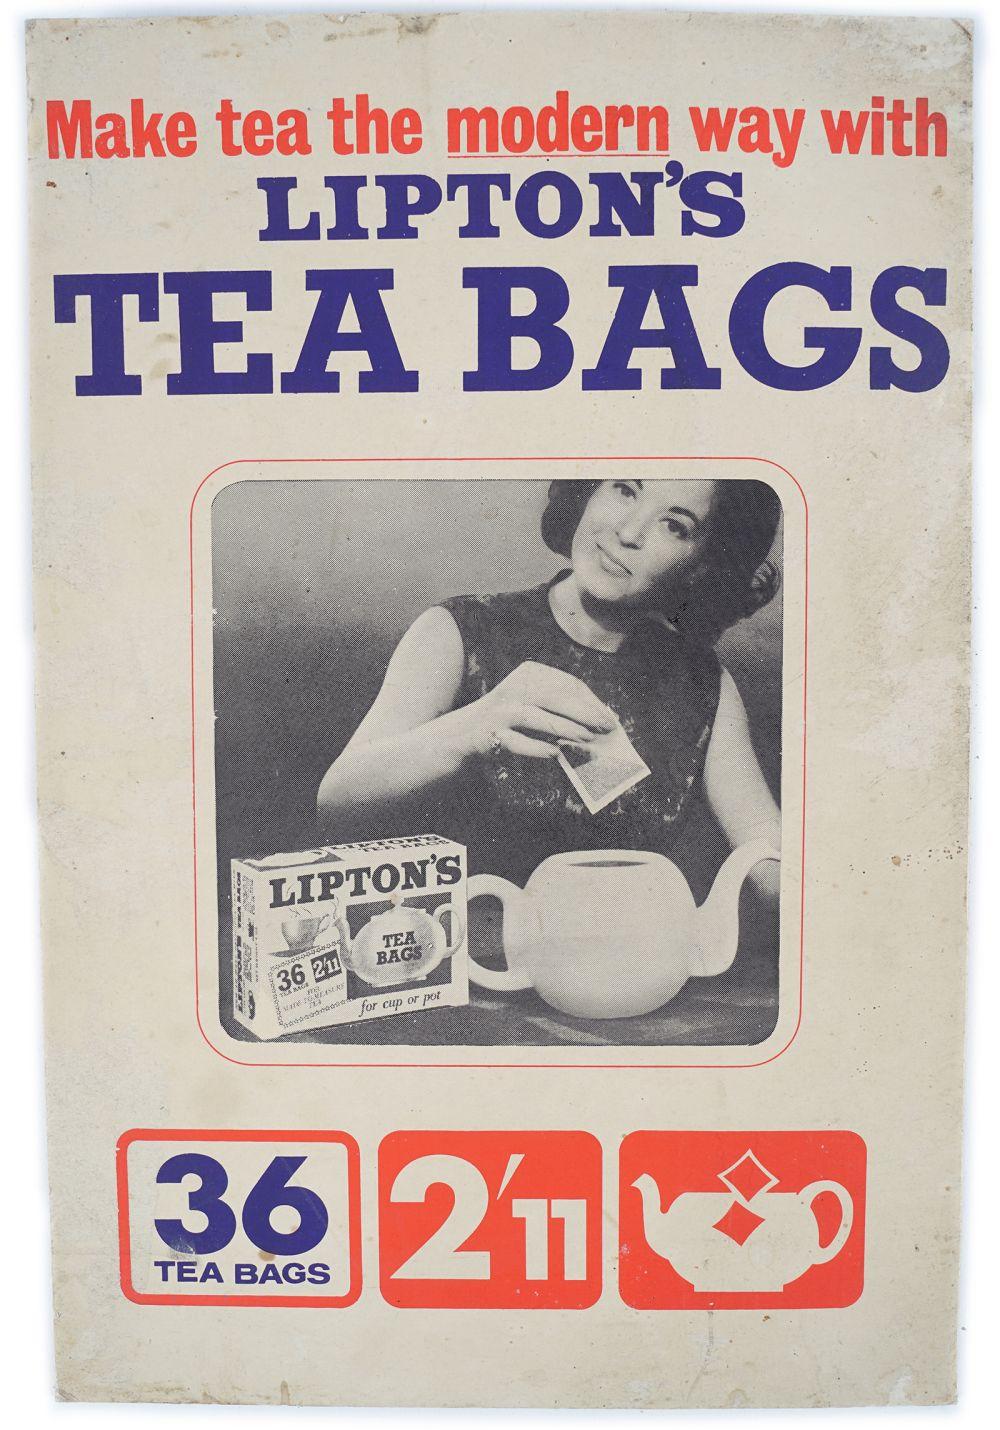 LIPTON'S TEA BAGS ORIGINAL VINTAGE POSTER